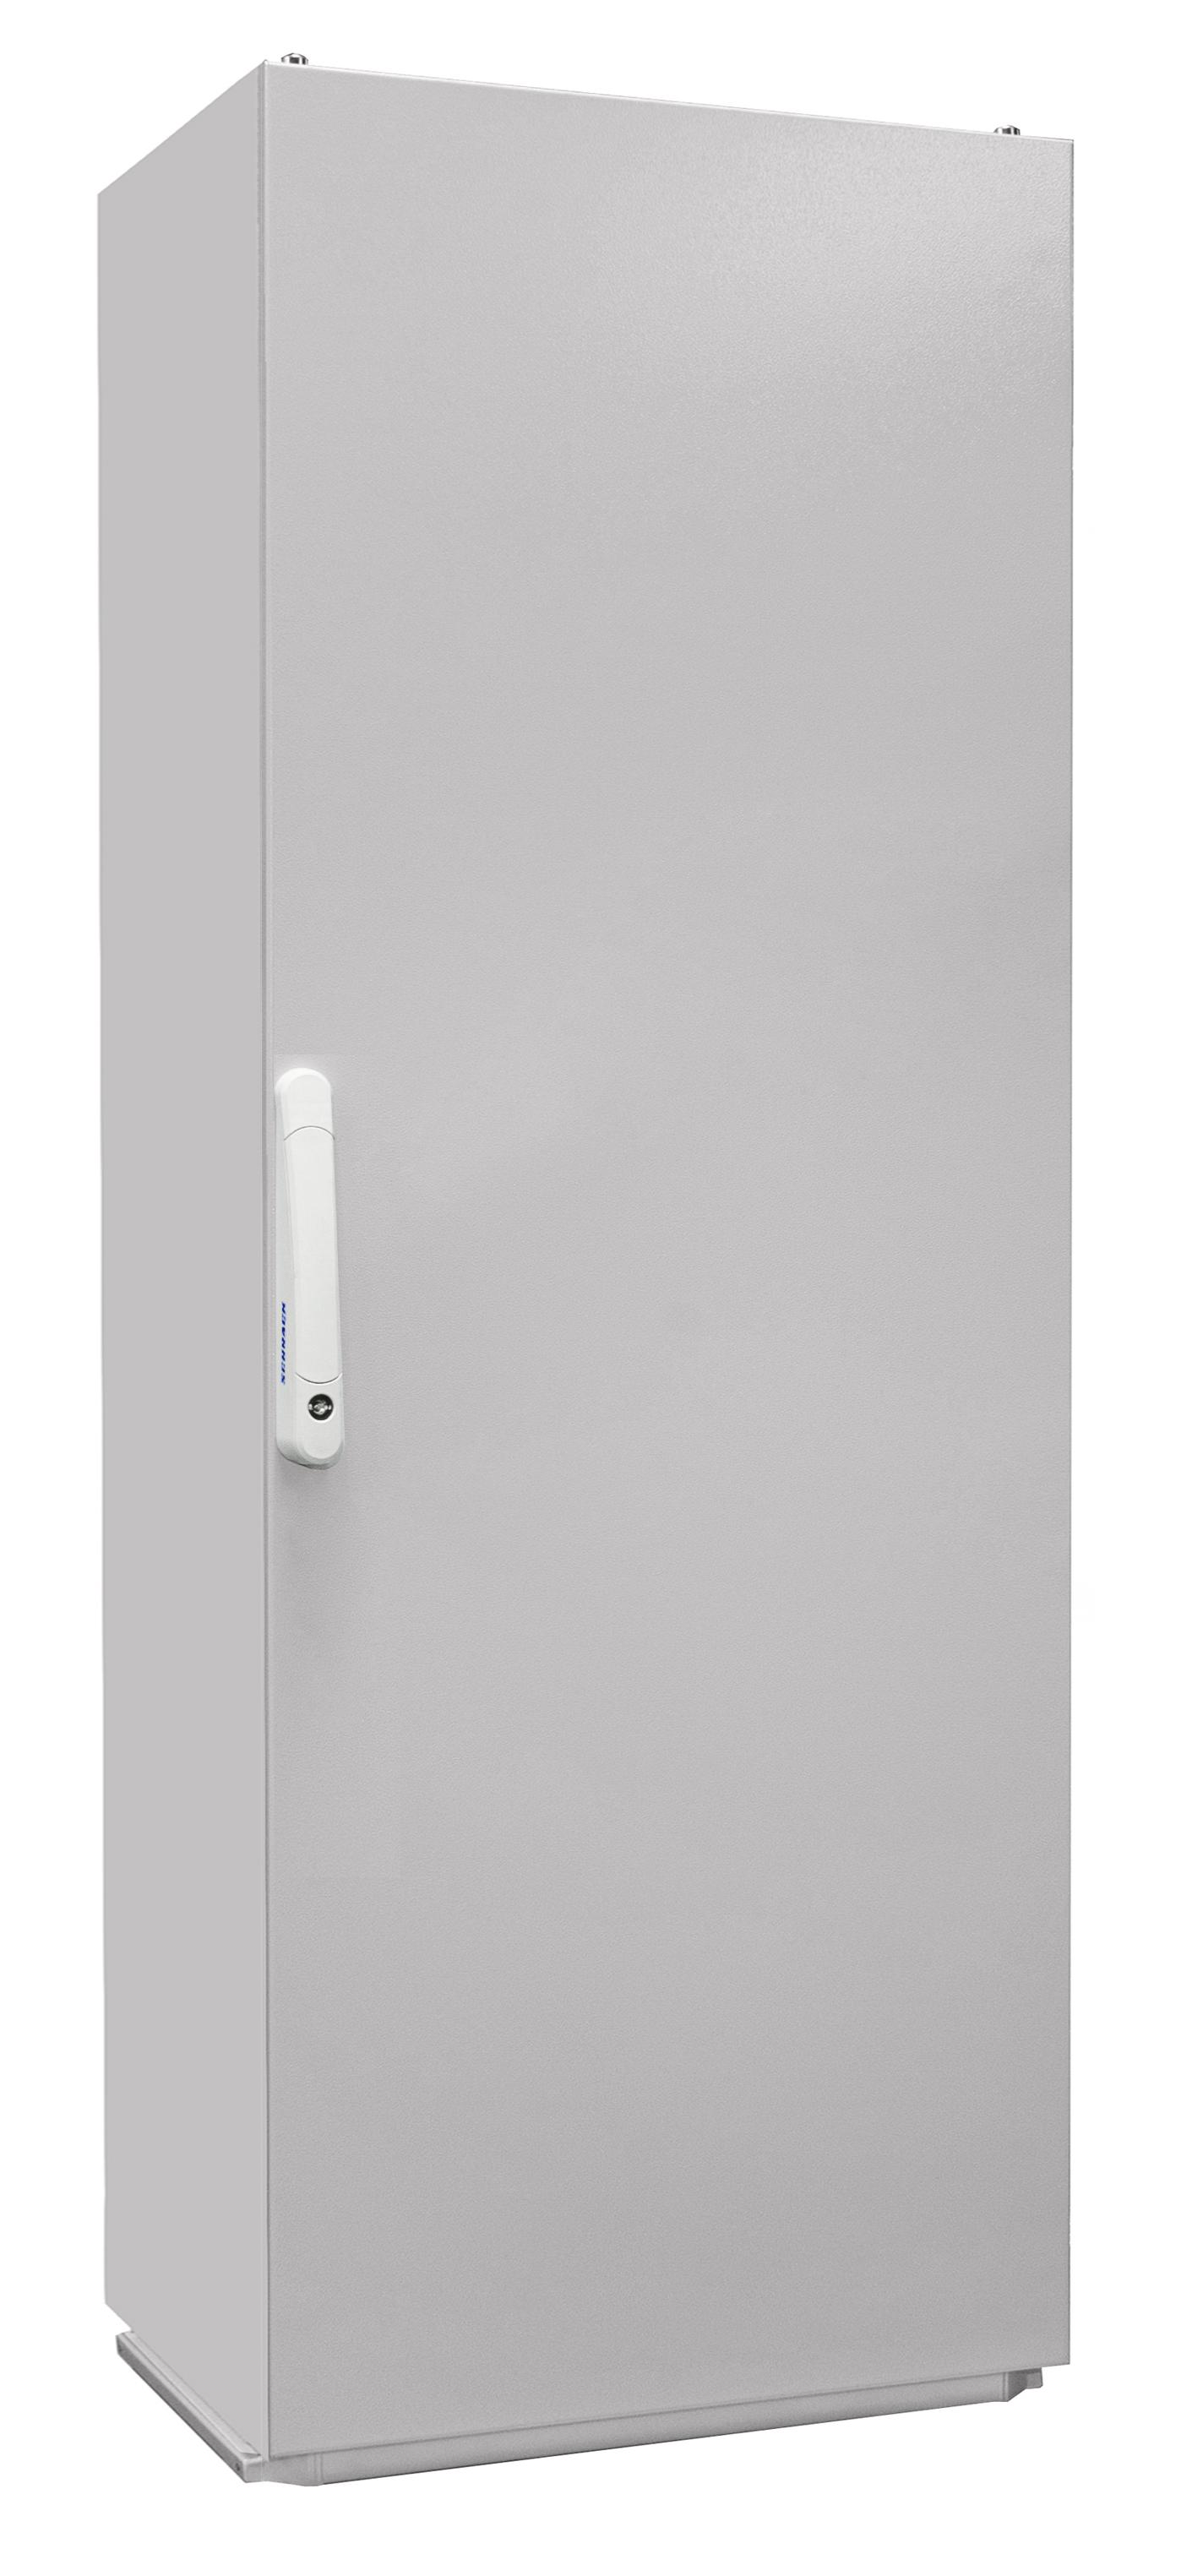 1 Stk Kompaktschrank 1-Tür IP55 H=1600 B=600 T=400mm Stahlblech KC166040--